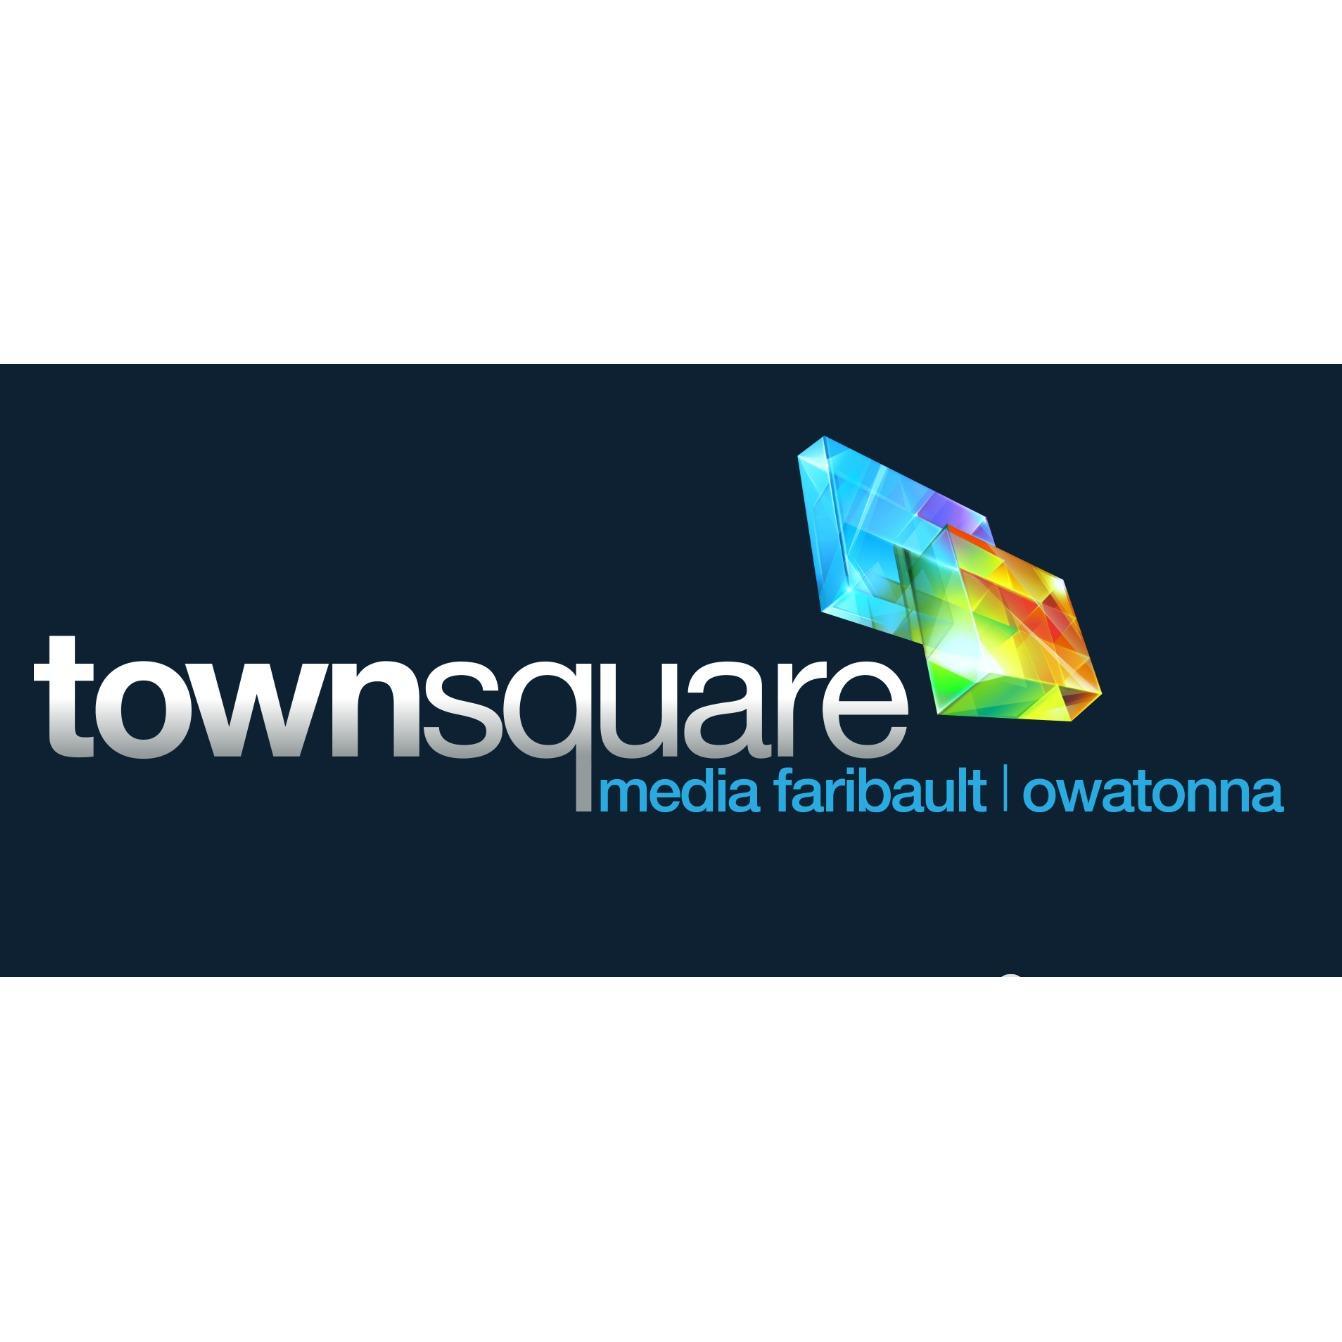 Townsquare Media Faribault